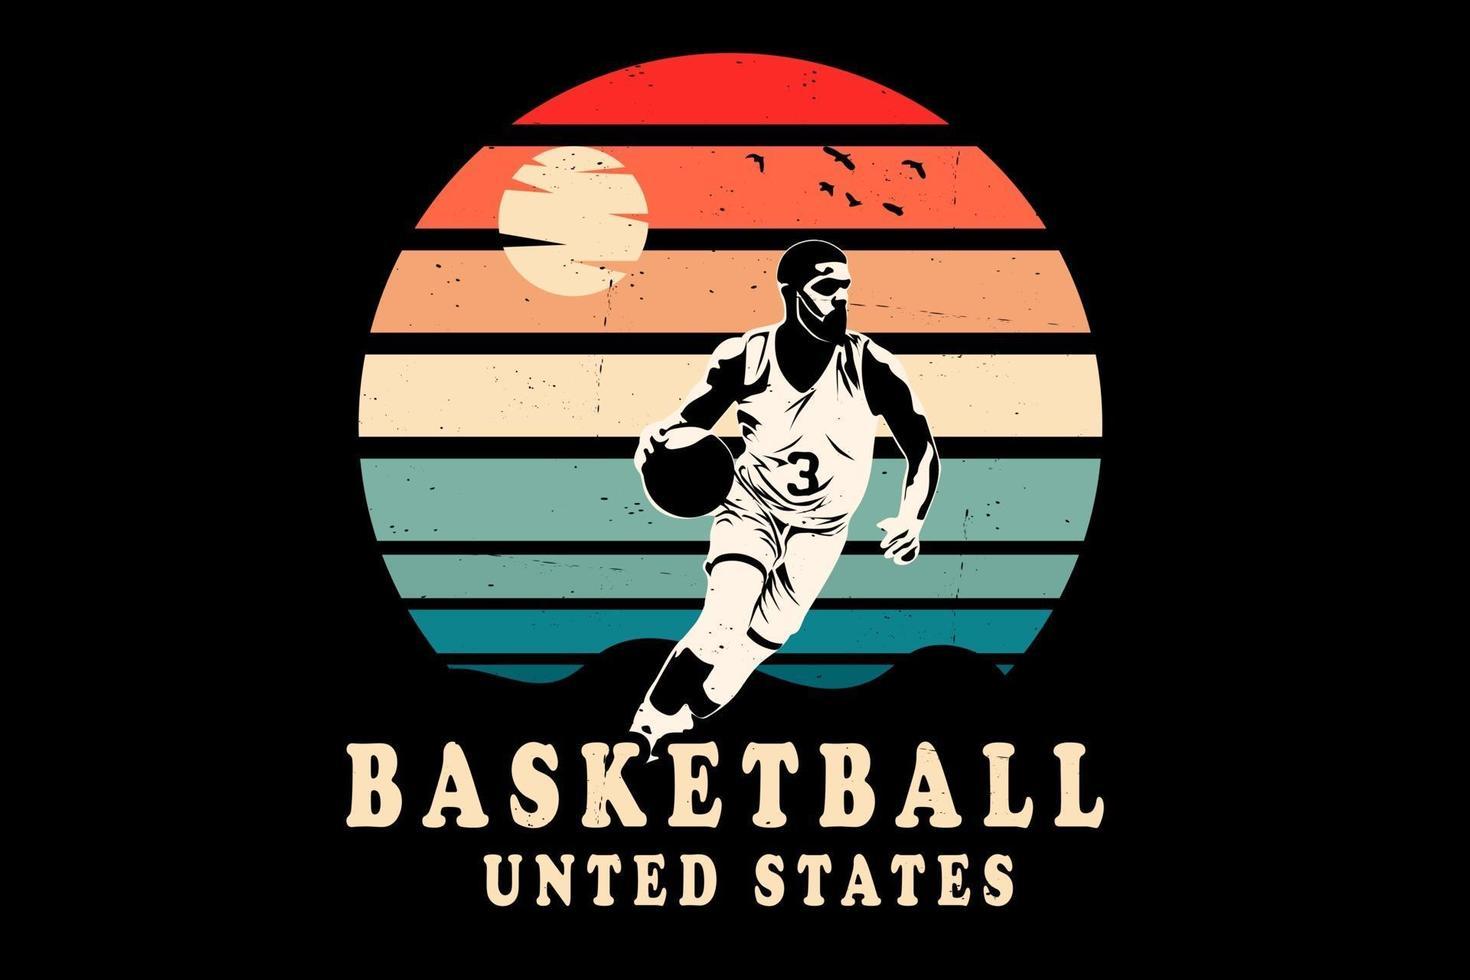 desenho da silhueta dos estados unidos de basquete vetor